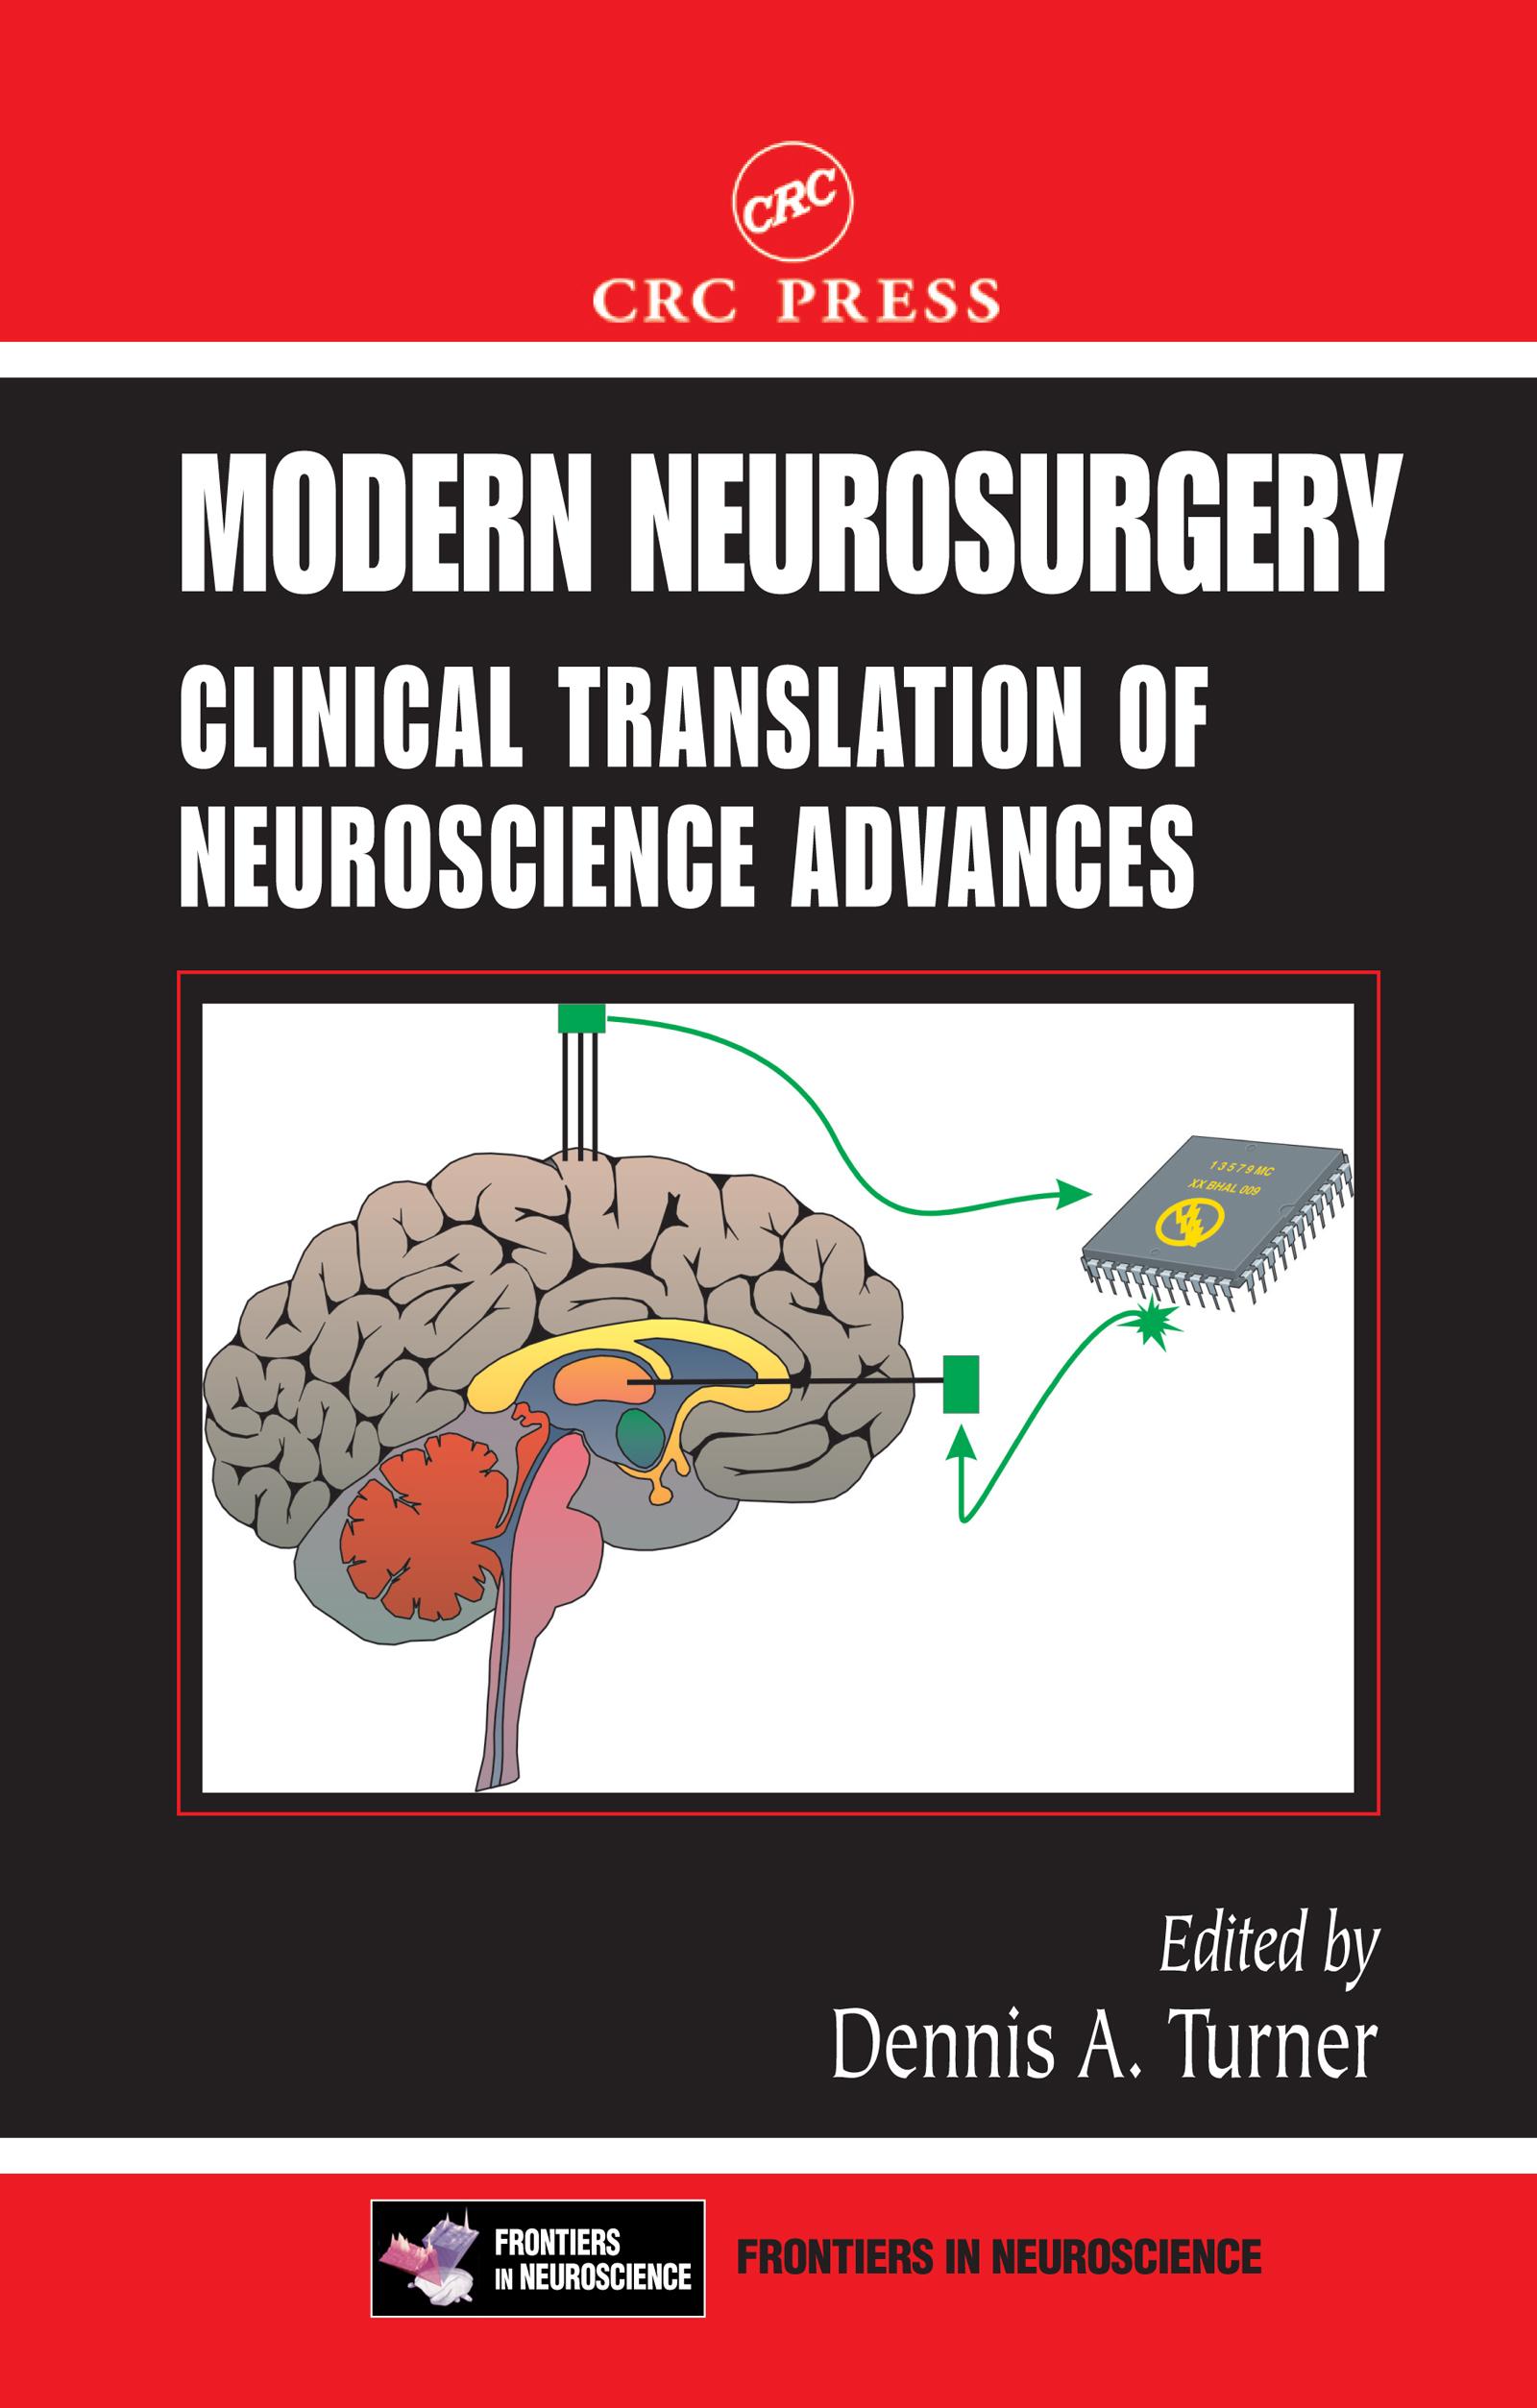 Delayed Cerebral Vasospasm: Current Hypotheses and Future Treatments